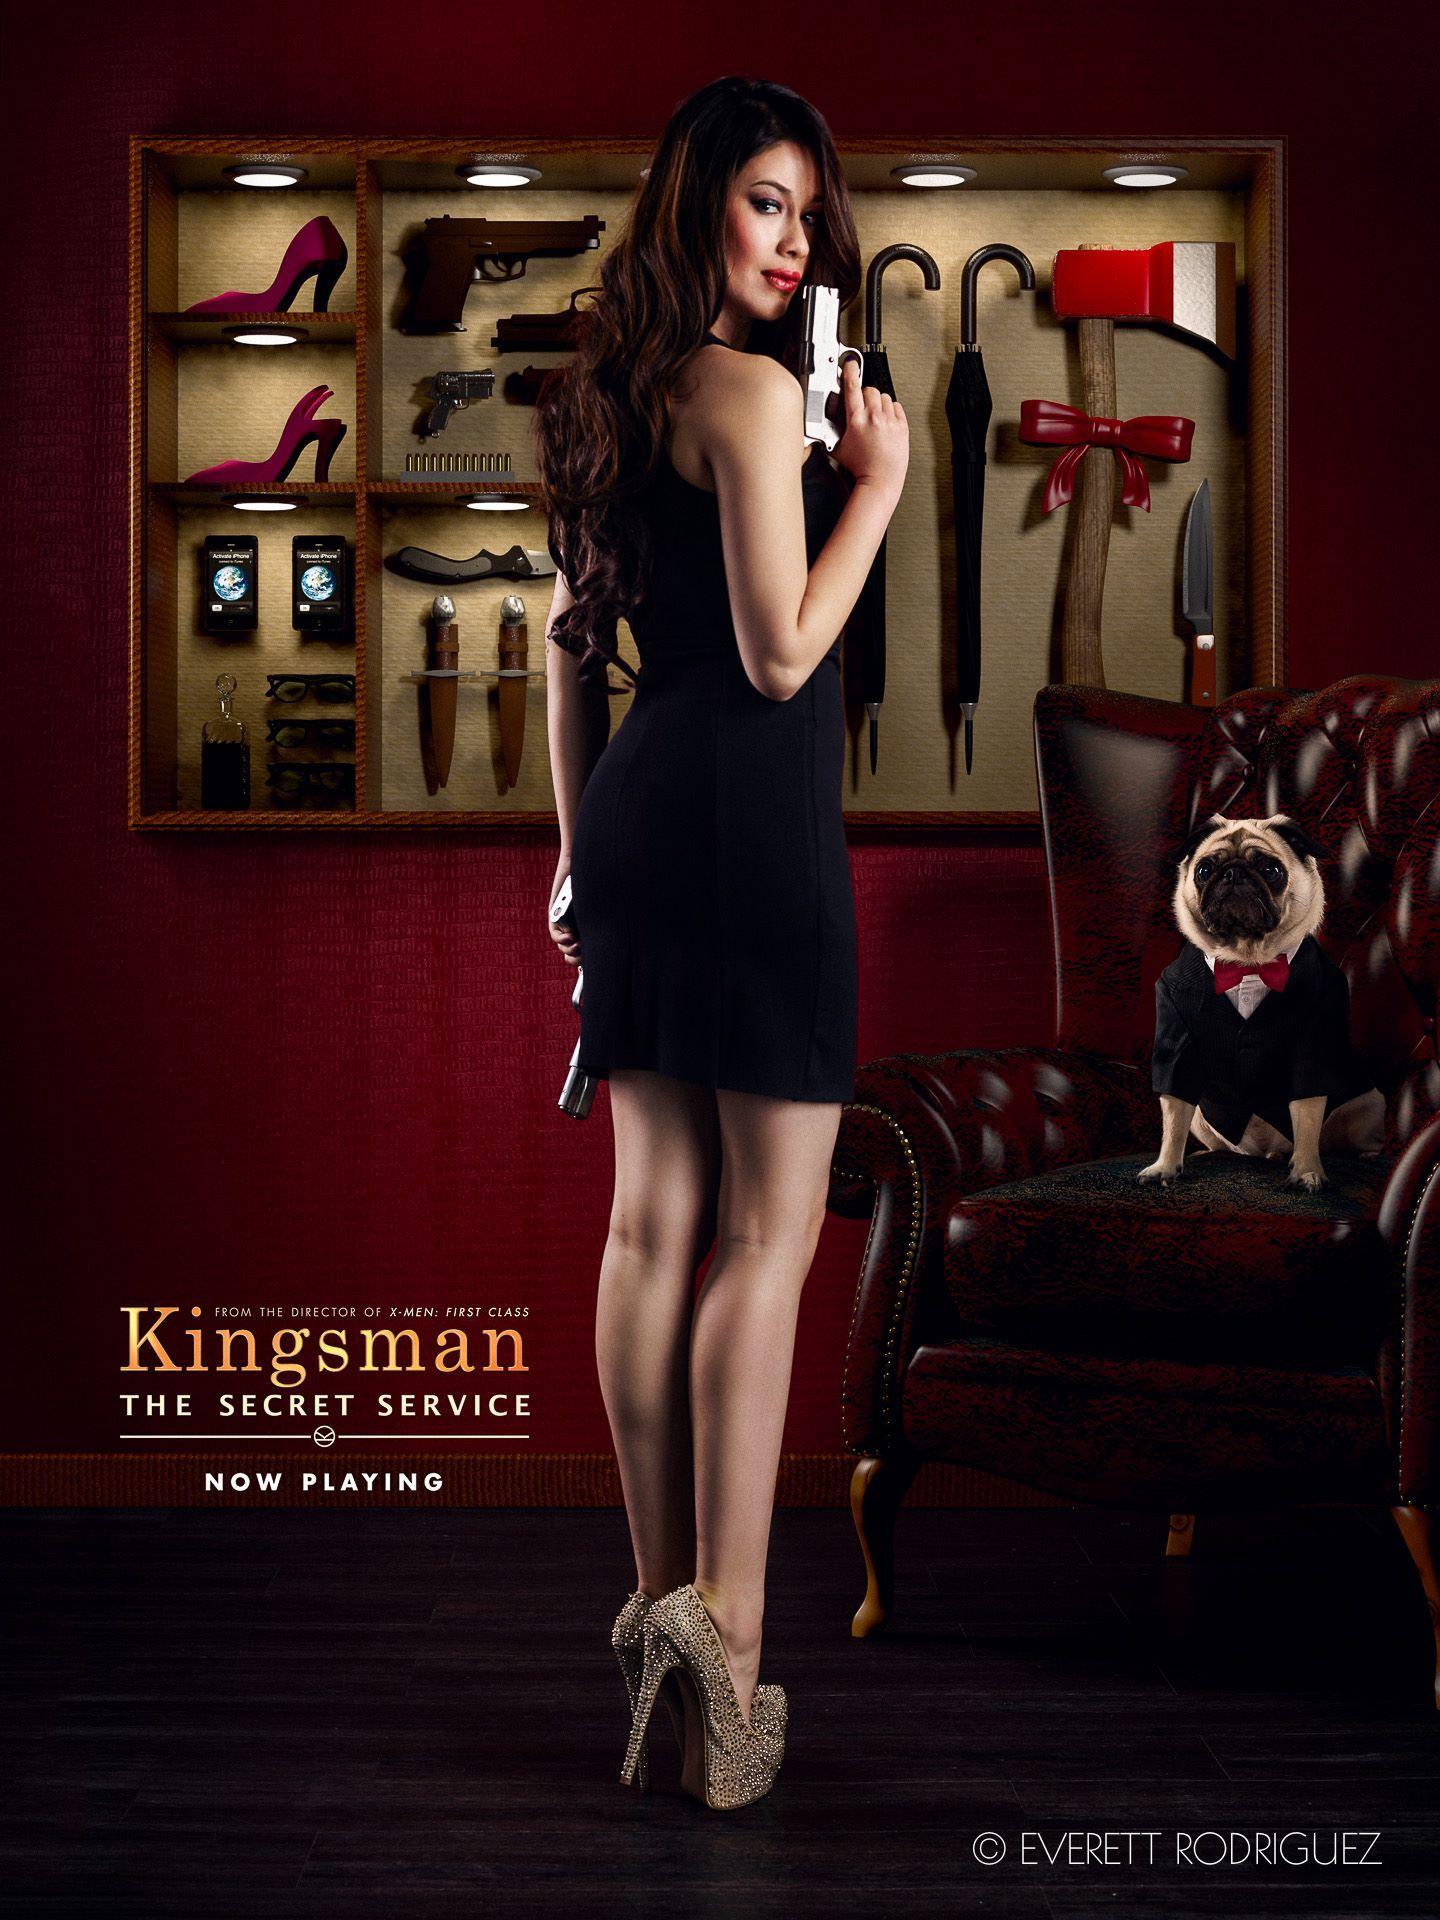 A Cheeze's version for Kingsman The Secret Service movie